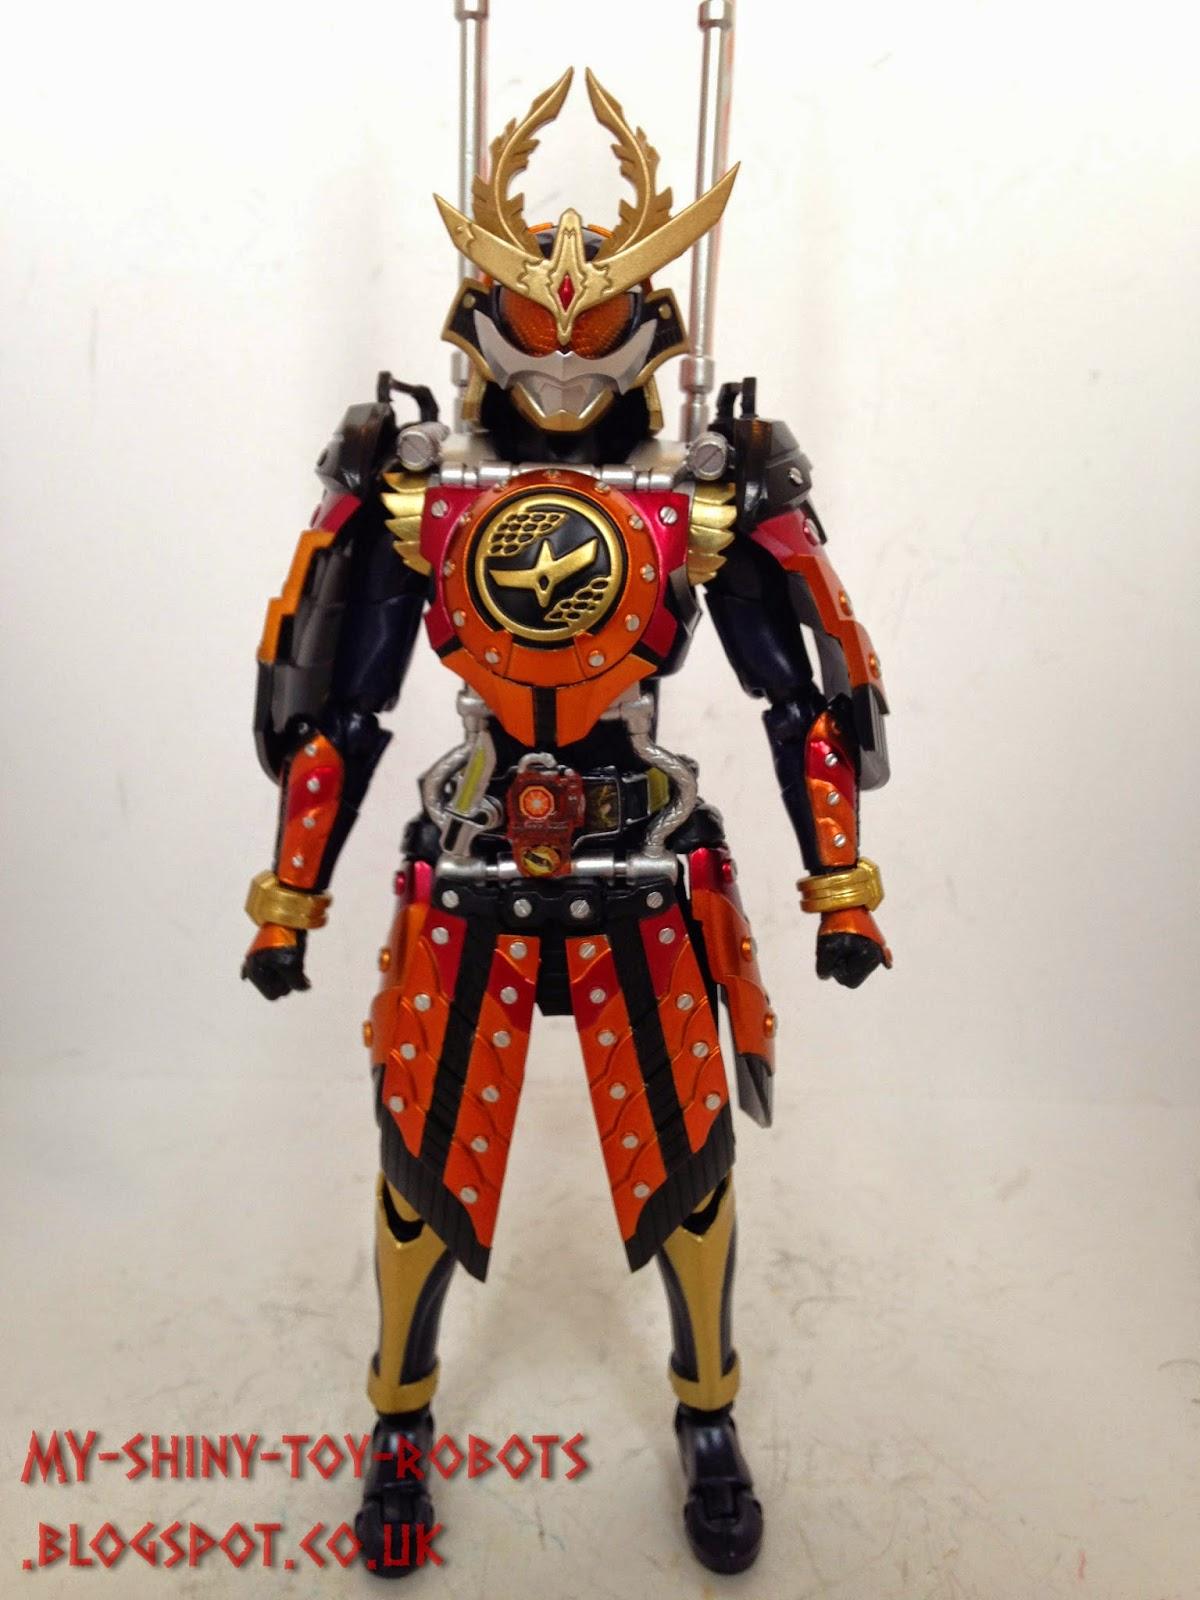 Drawn samurai kamen rider Figuarts Figure Gaim Rider S